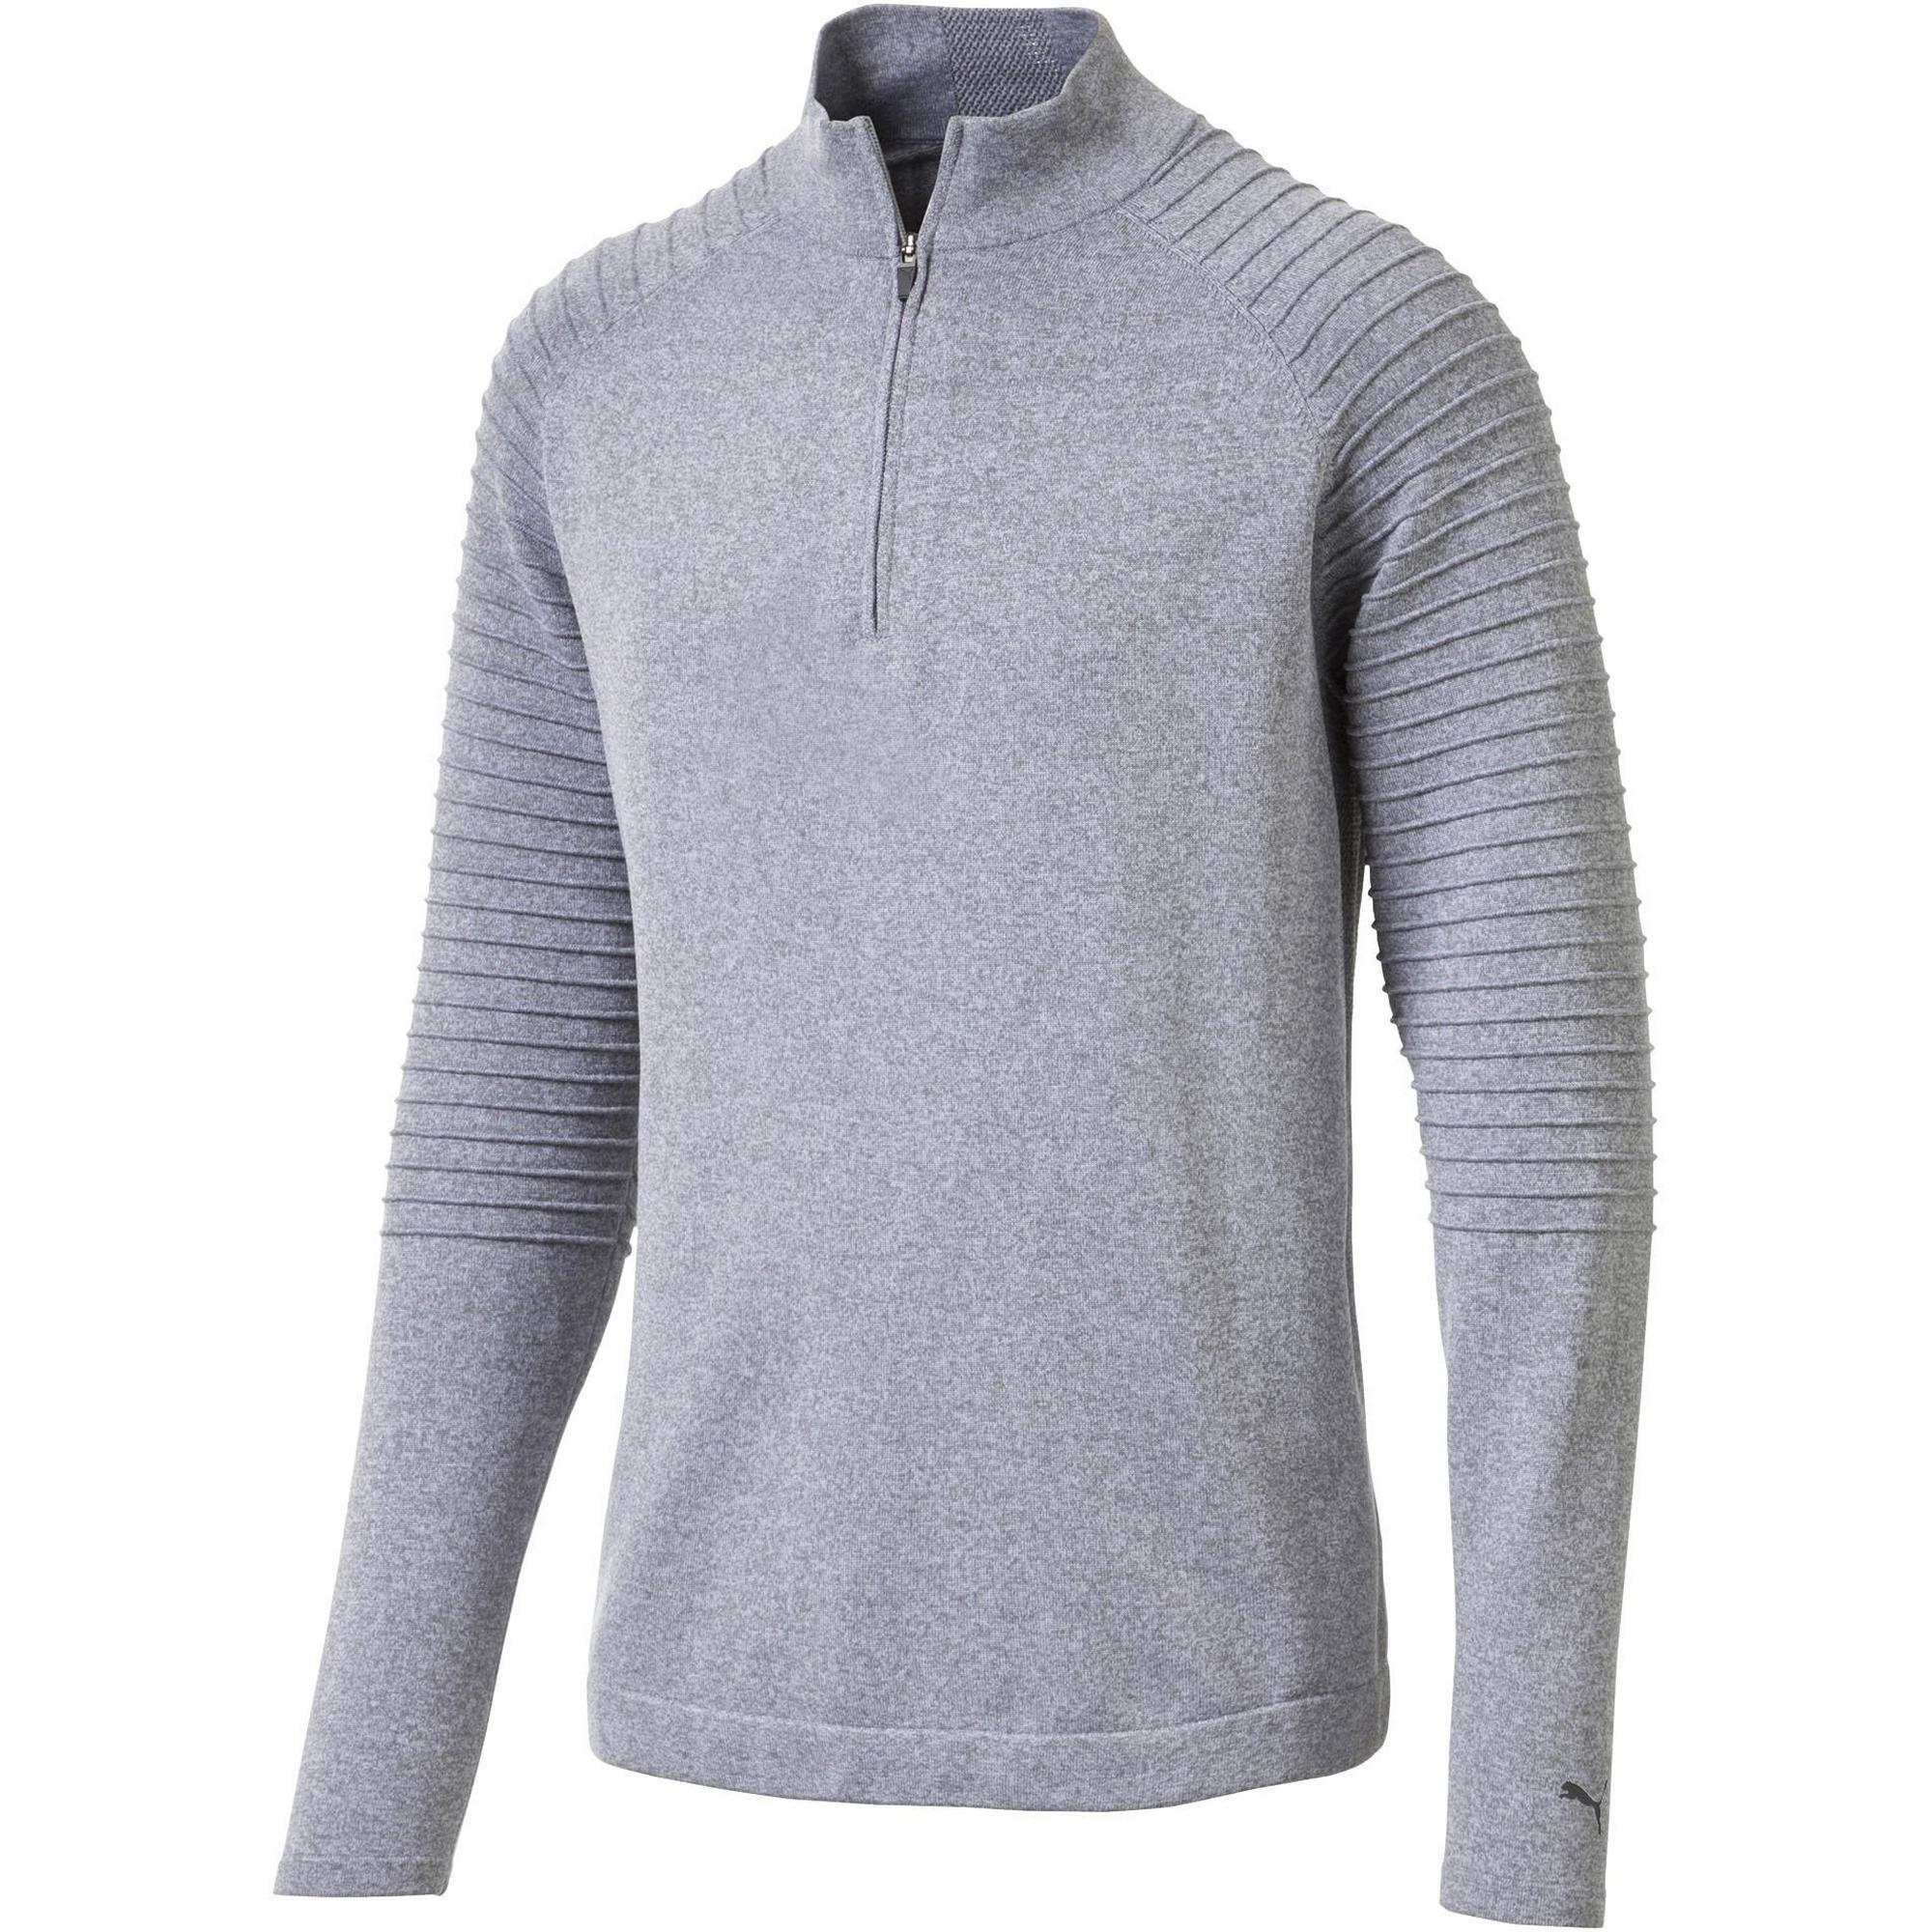 Men's Evoknit Performance 1/4 Pullover